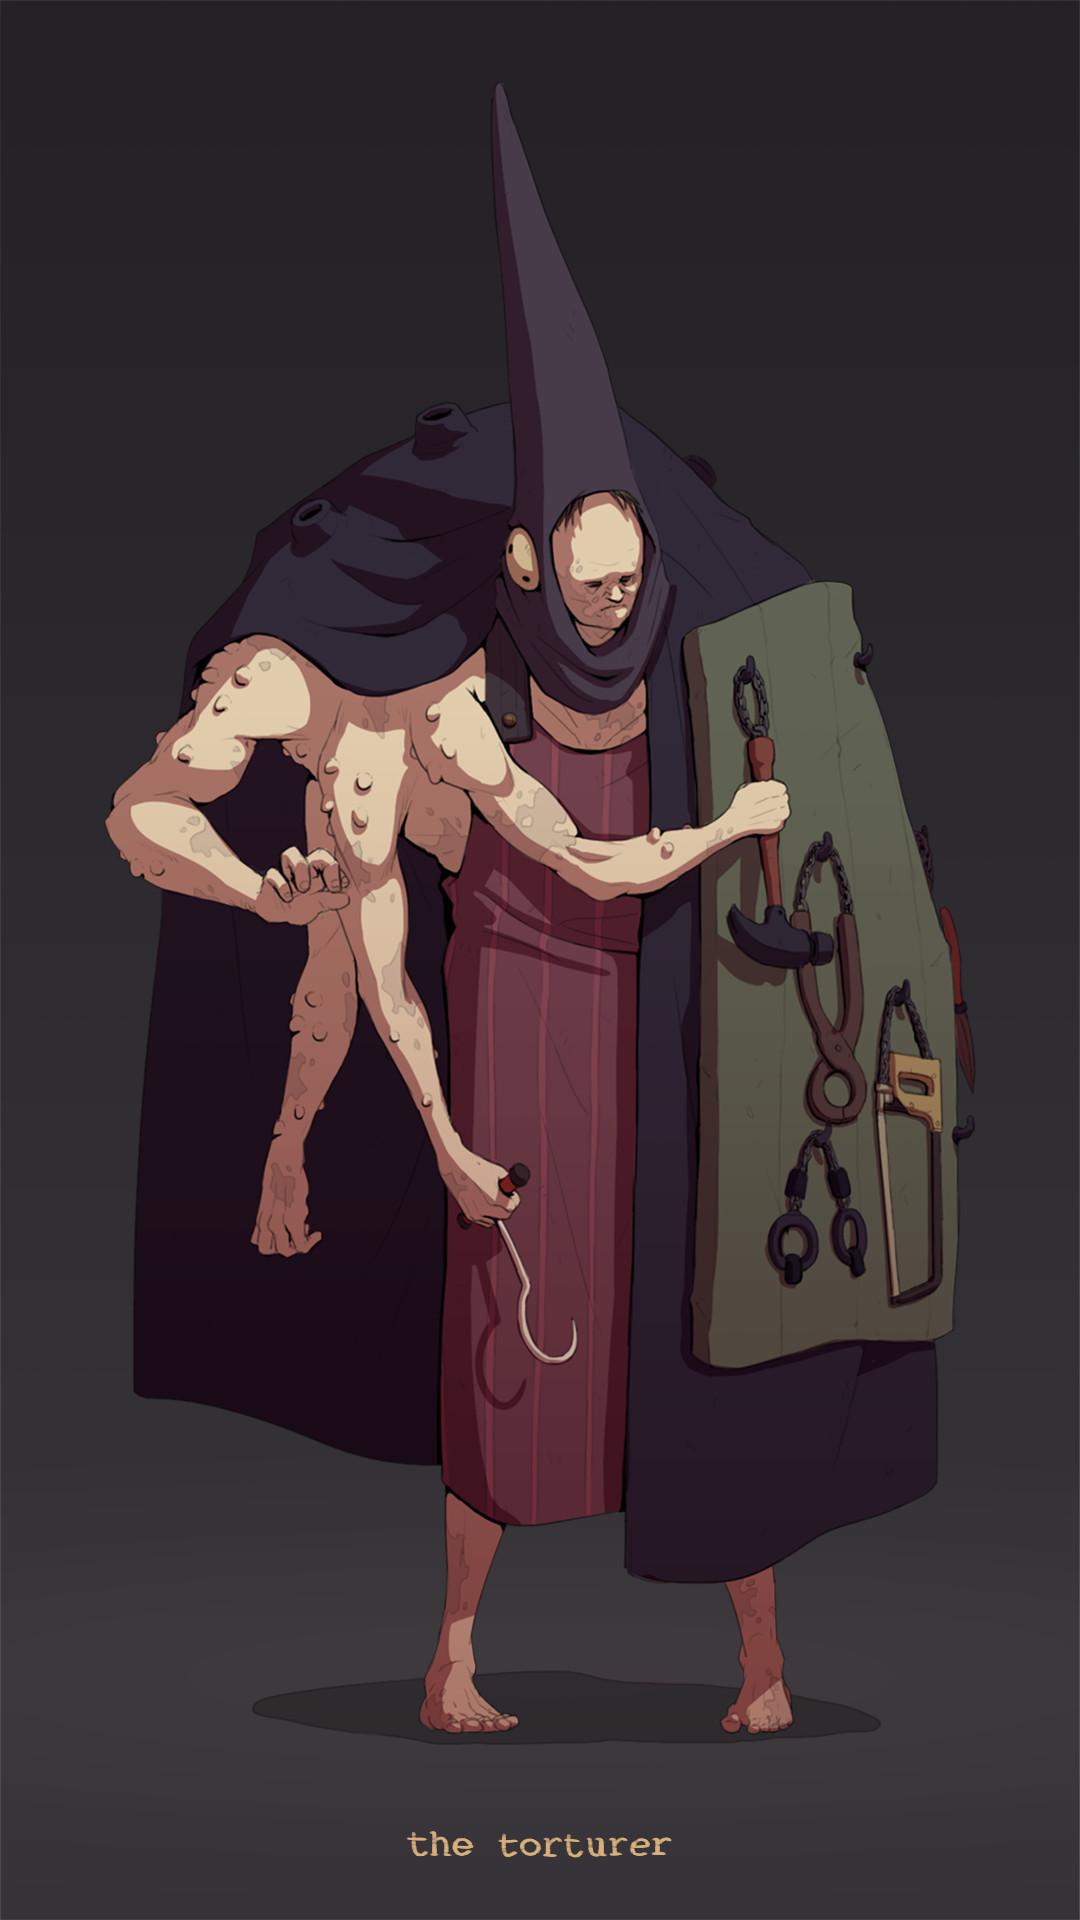 Nicolas tham deliverables torturer